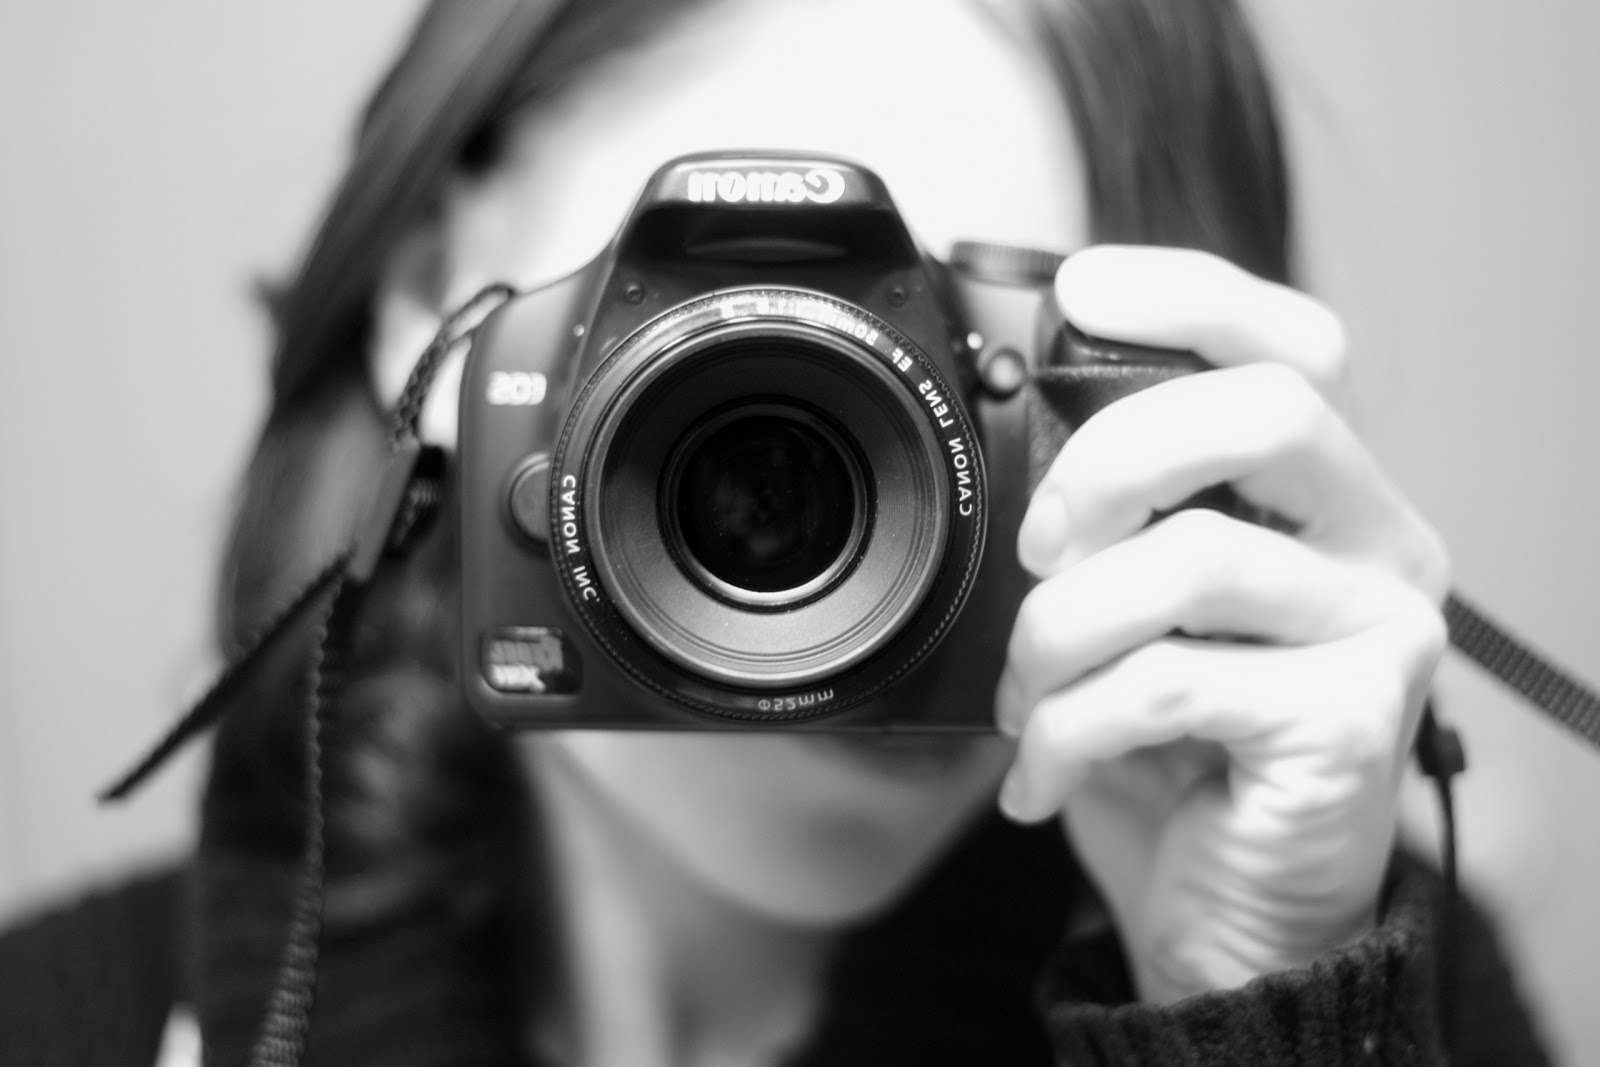 Triple Peas Photography monday january 18th 2011 love